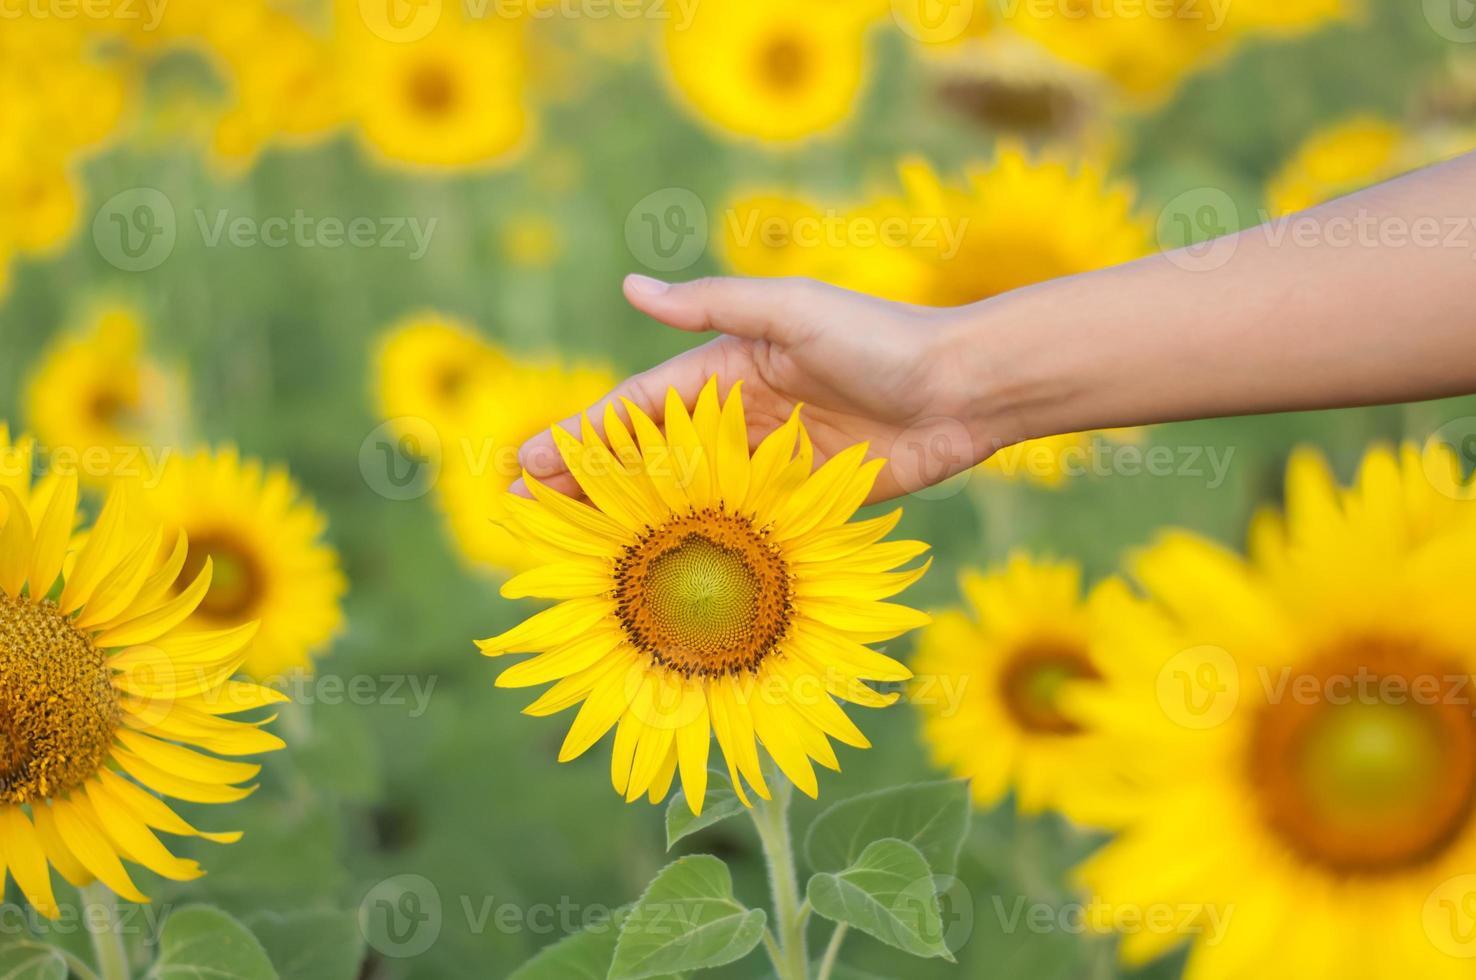 Yellow sunflower and female hands photo